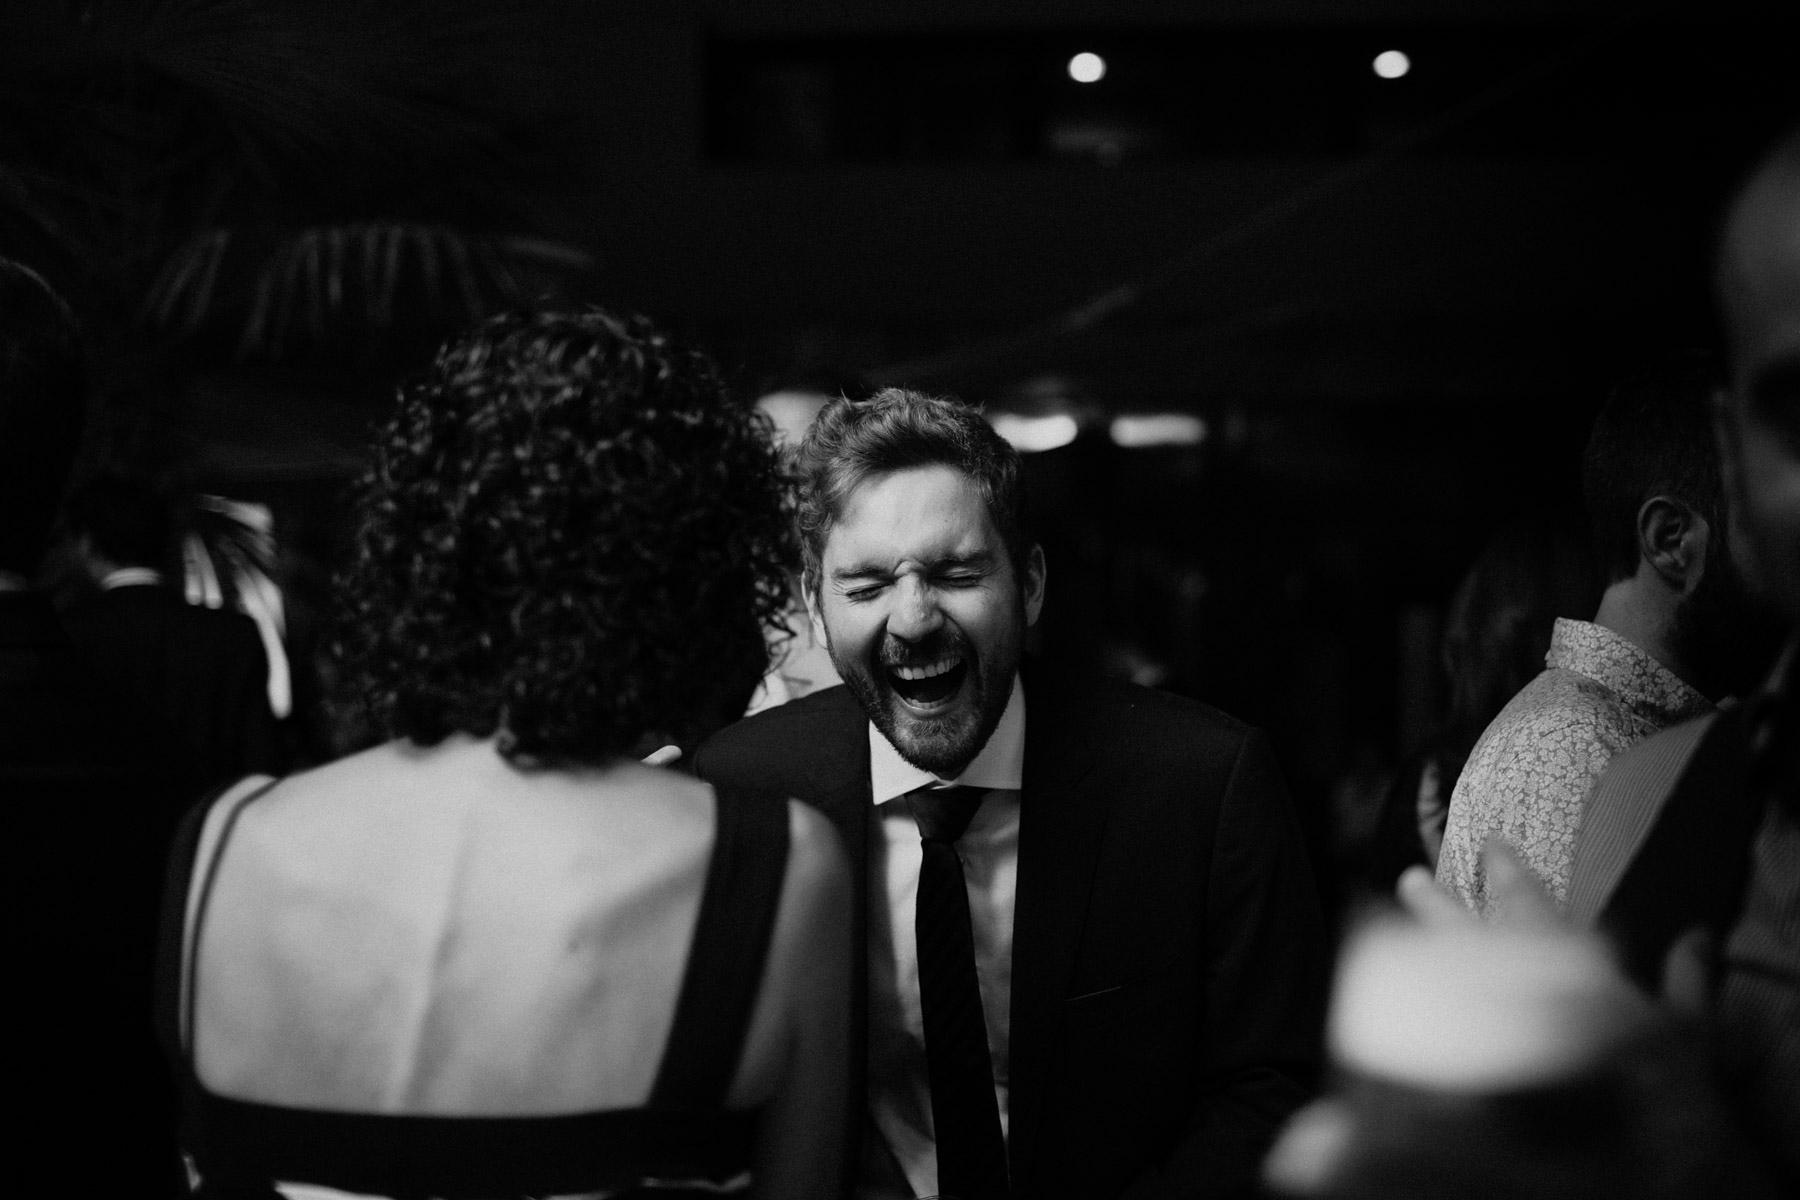 fotografo de bodas Jairo Crena-61